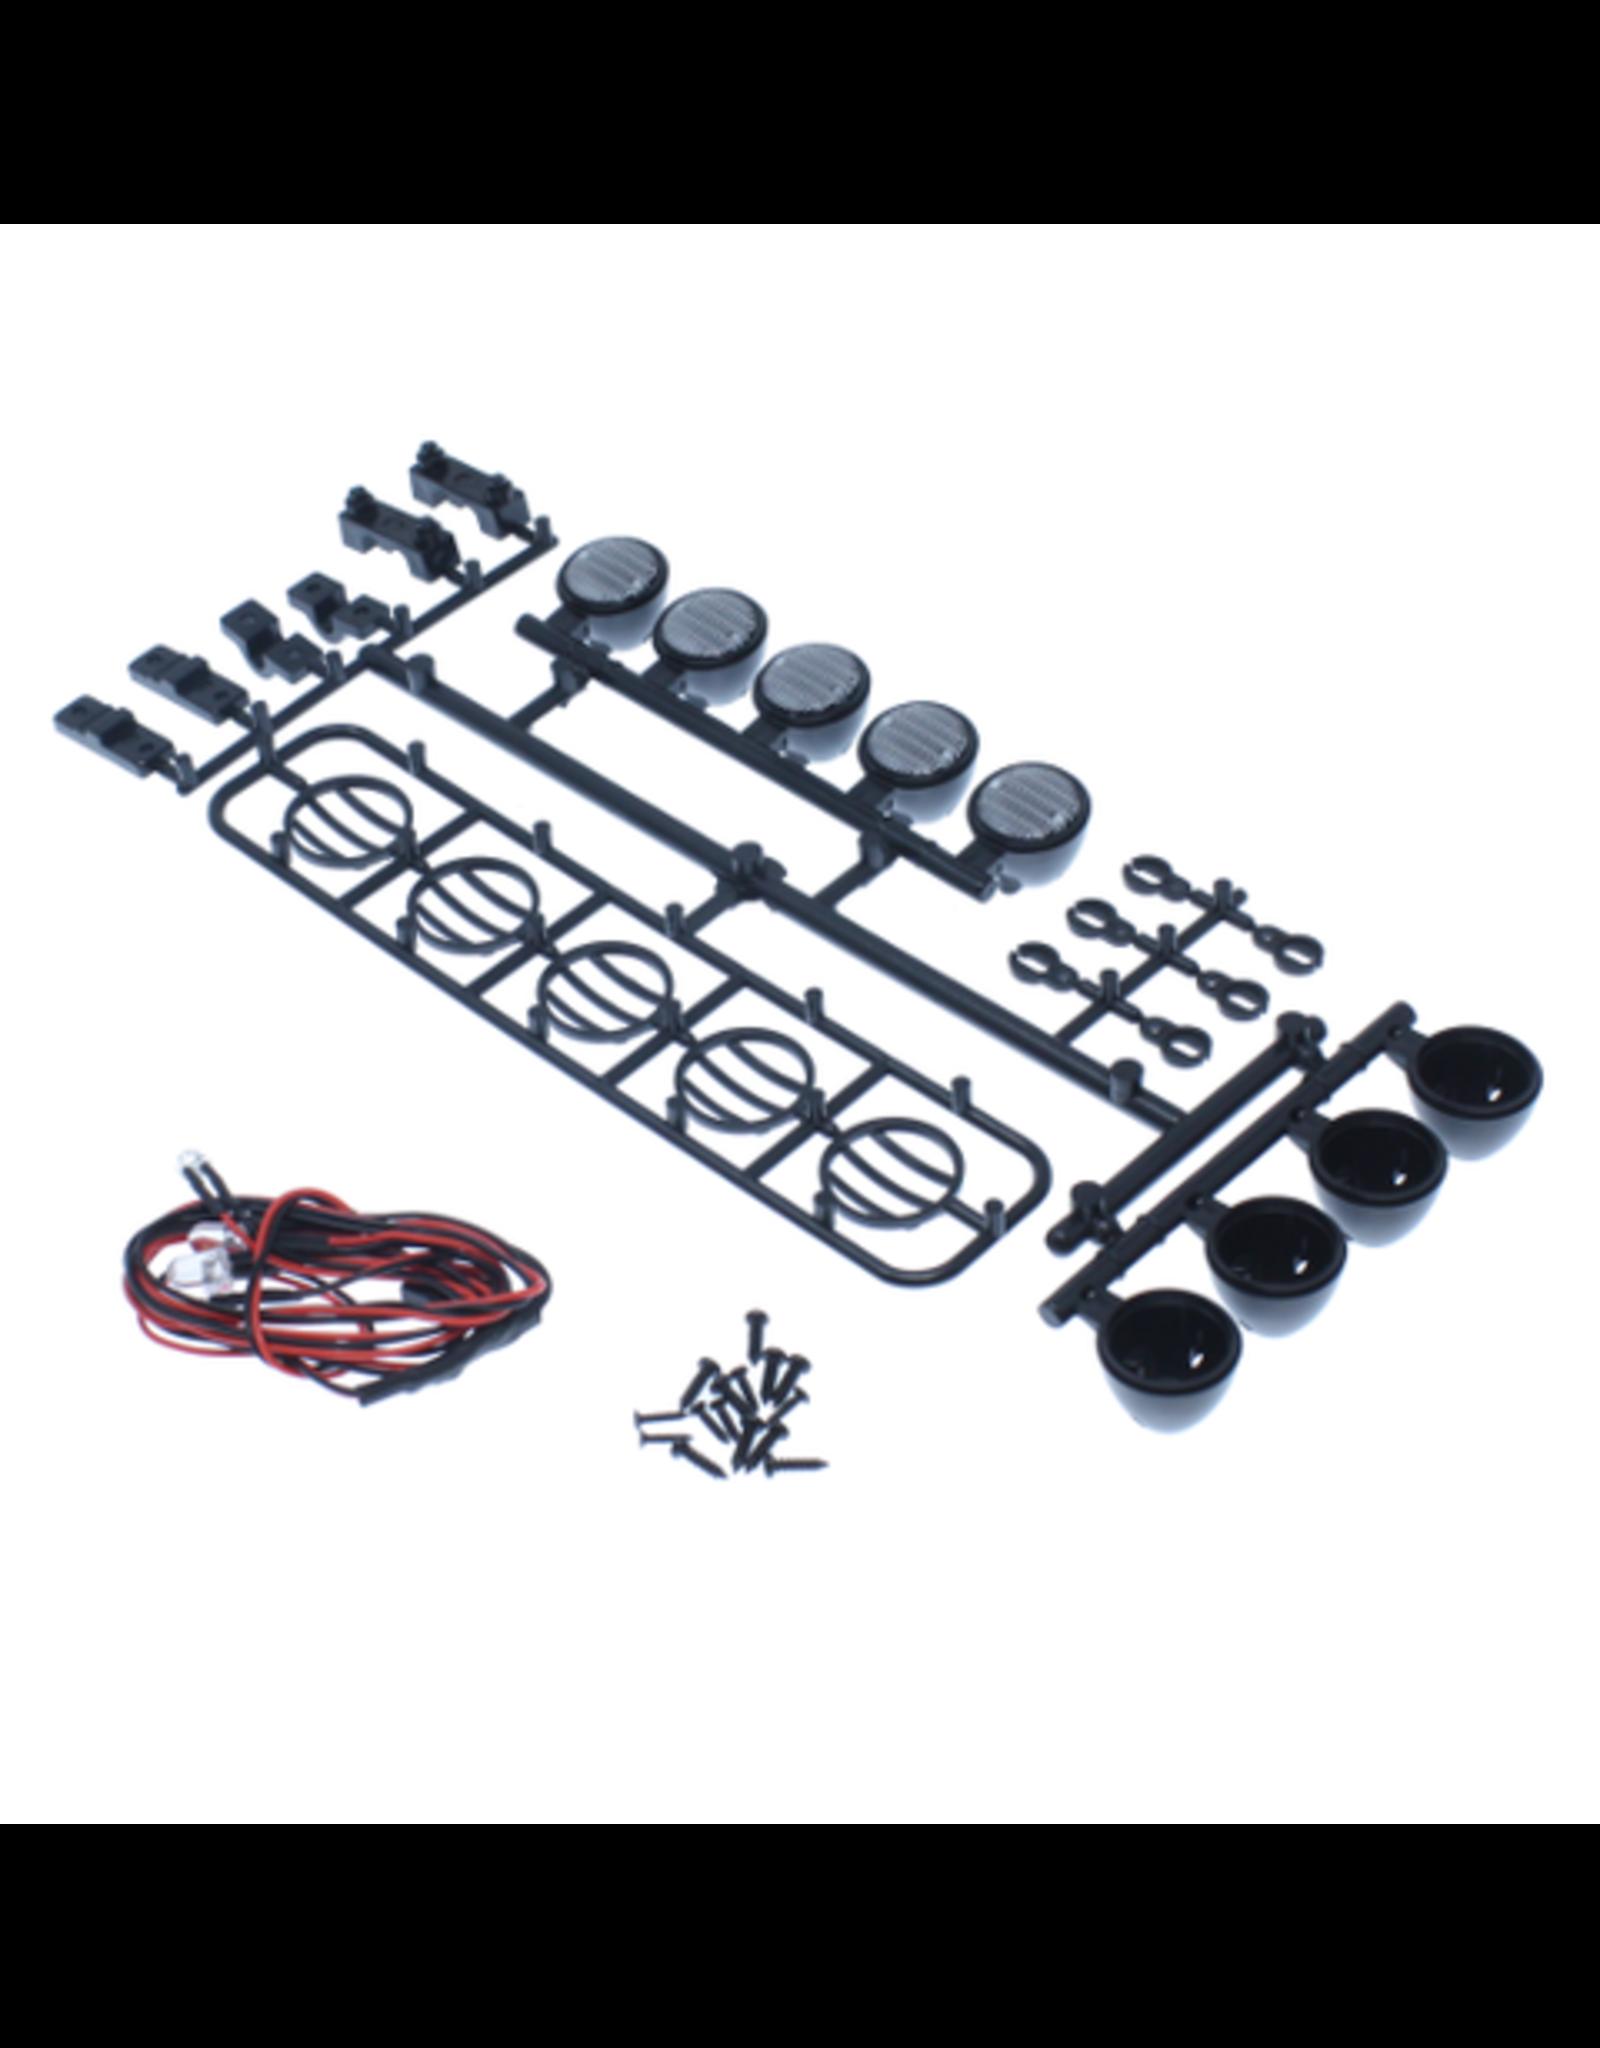 Redcat Racing LED Crawler Light Bar Set(5 Spotlight) Black (LED lights are white, Plastic Light bar is black)